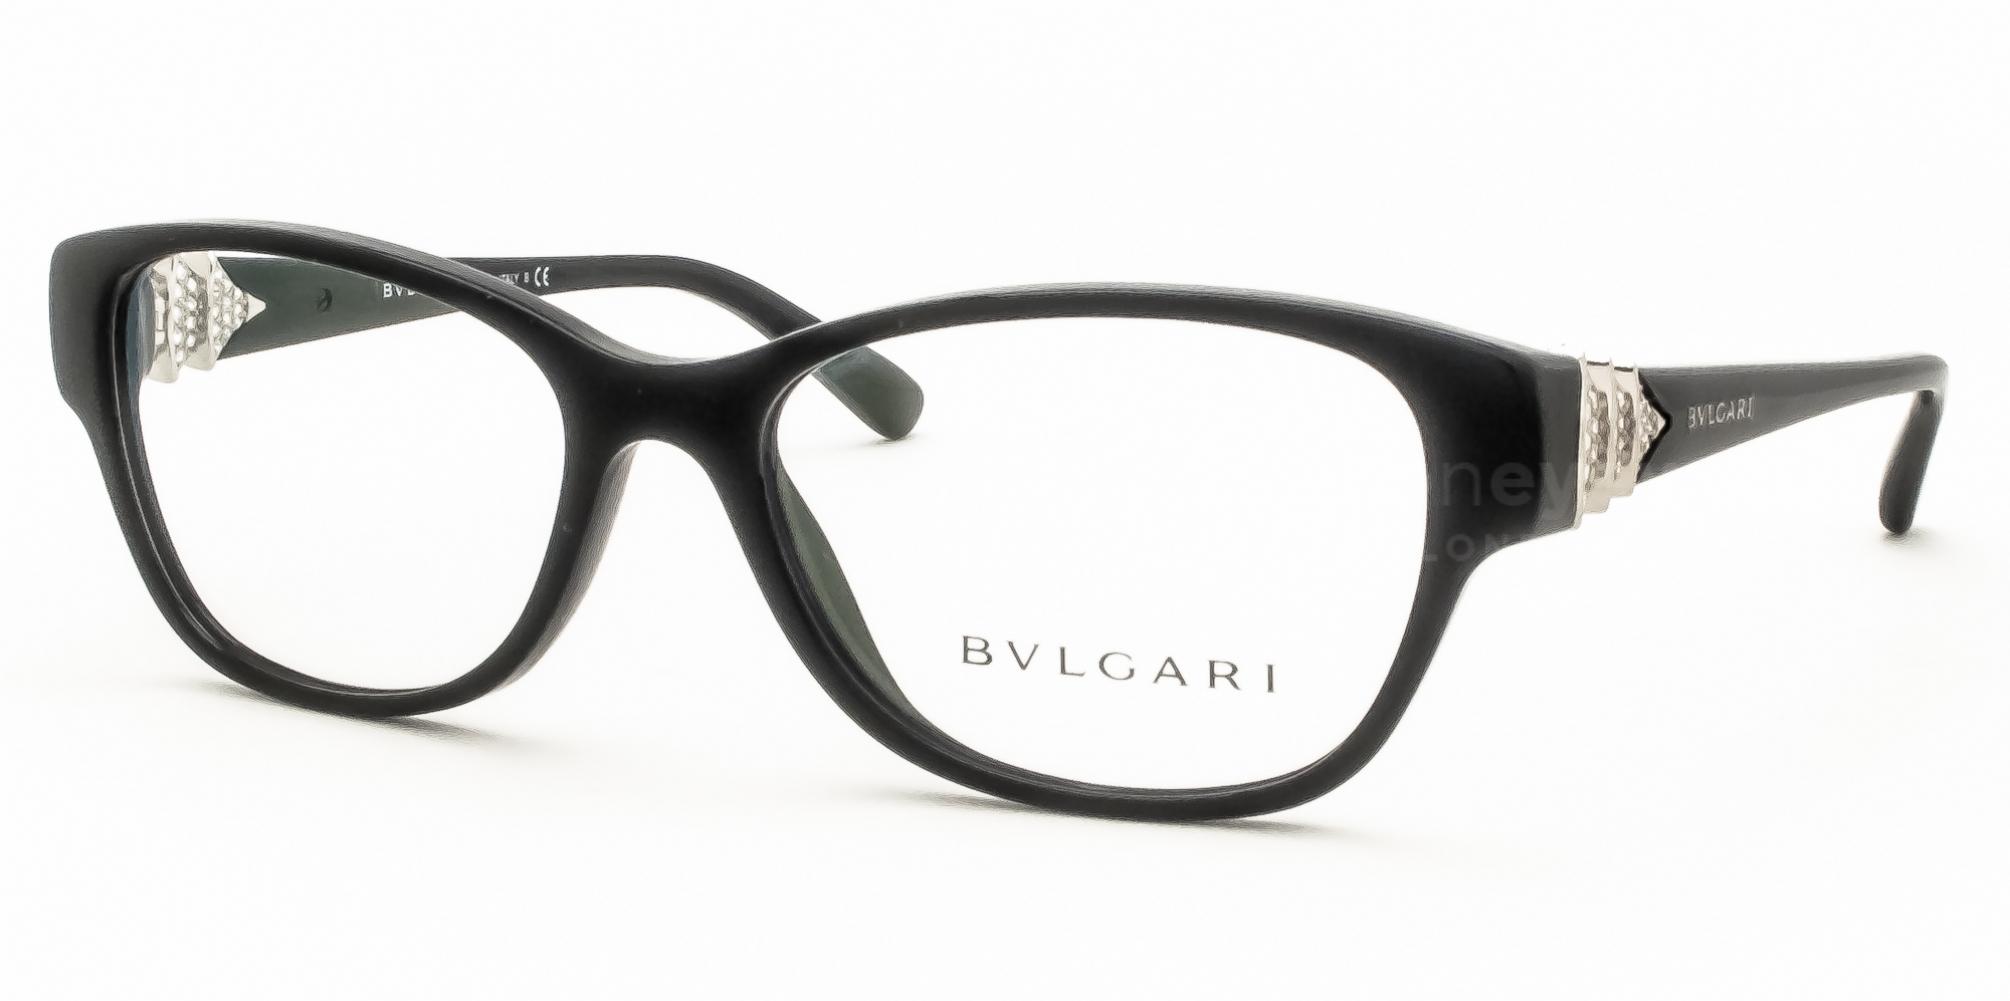 8909c2aa7b Bvlgari Prescription Eyeglasses - Bitterroot Public Library